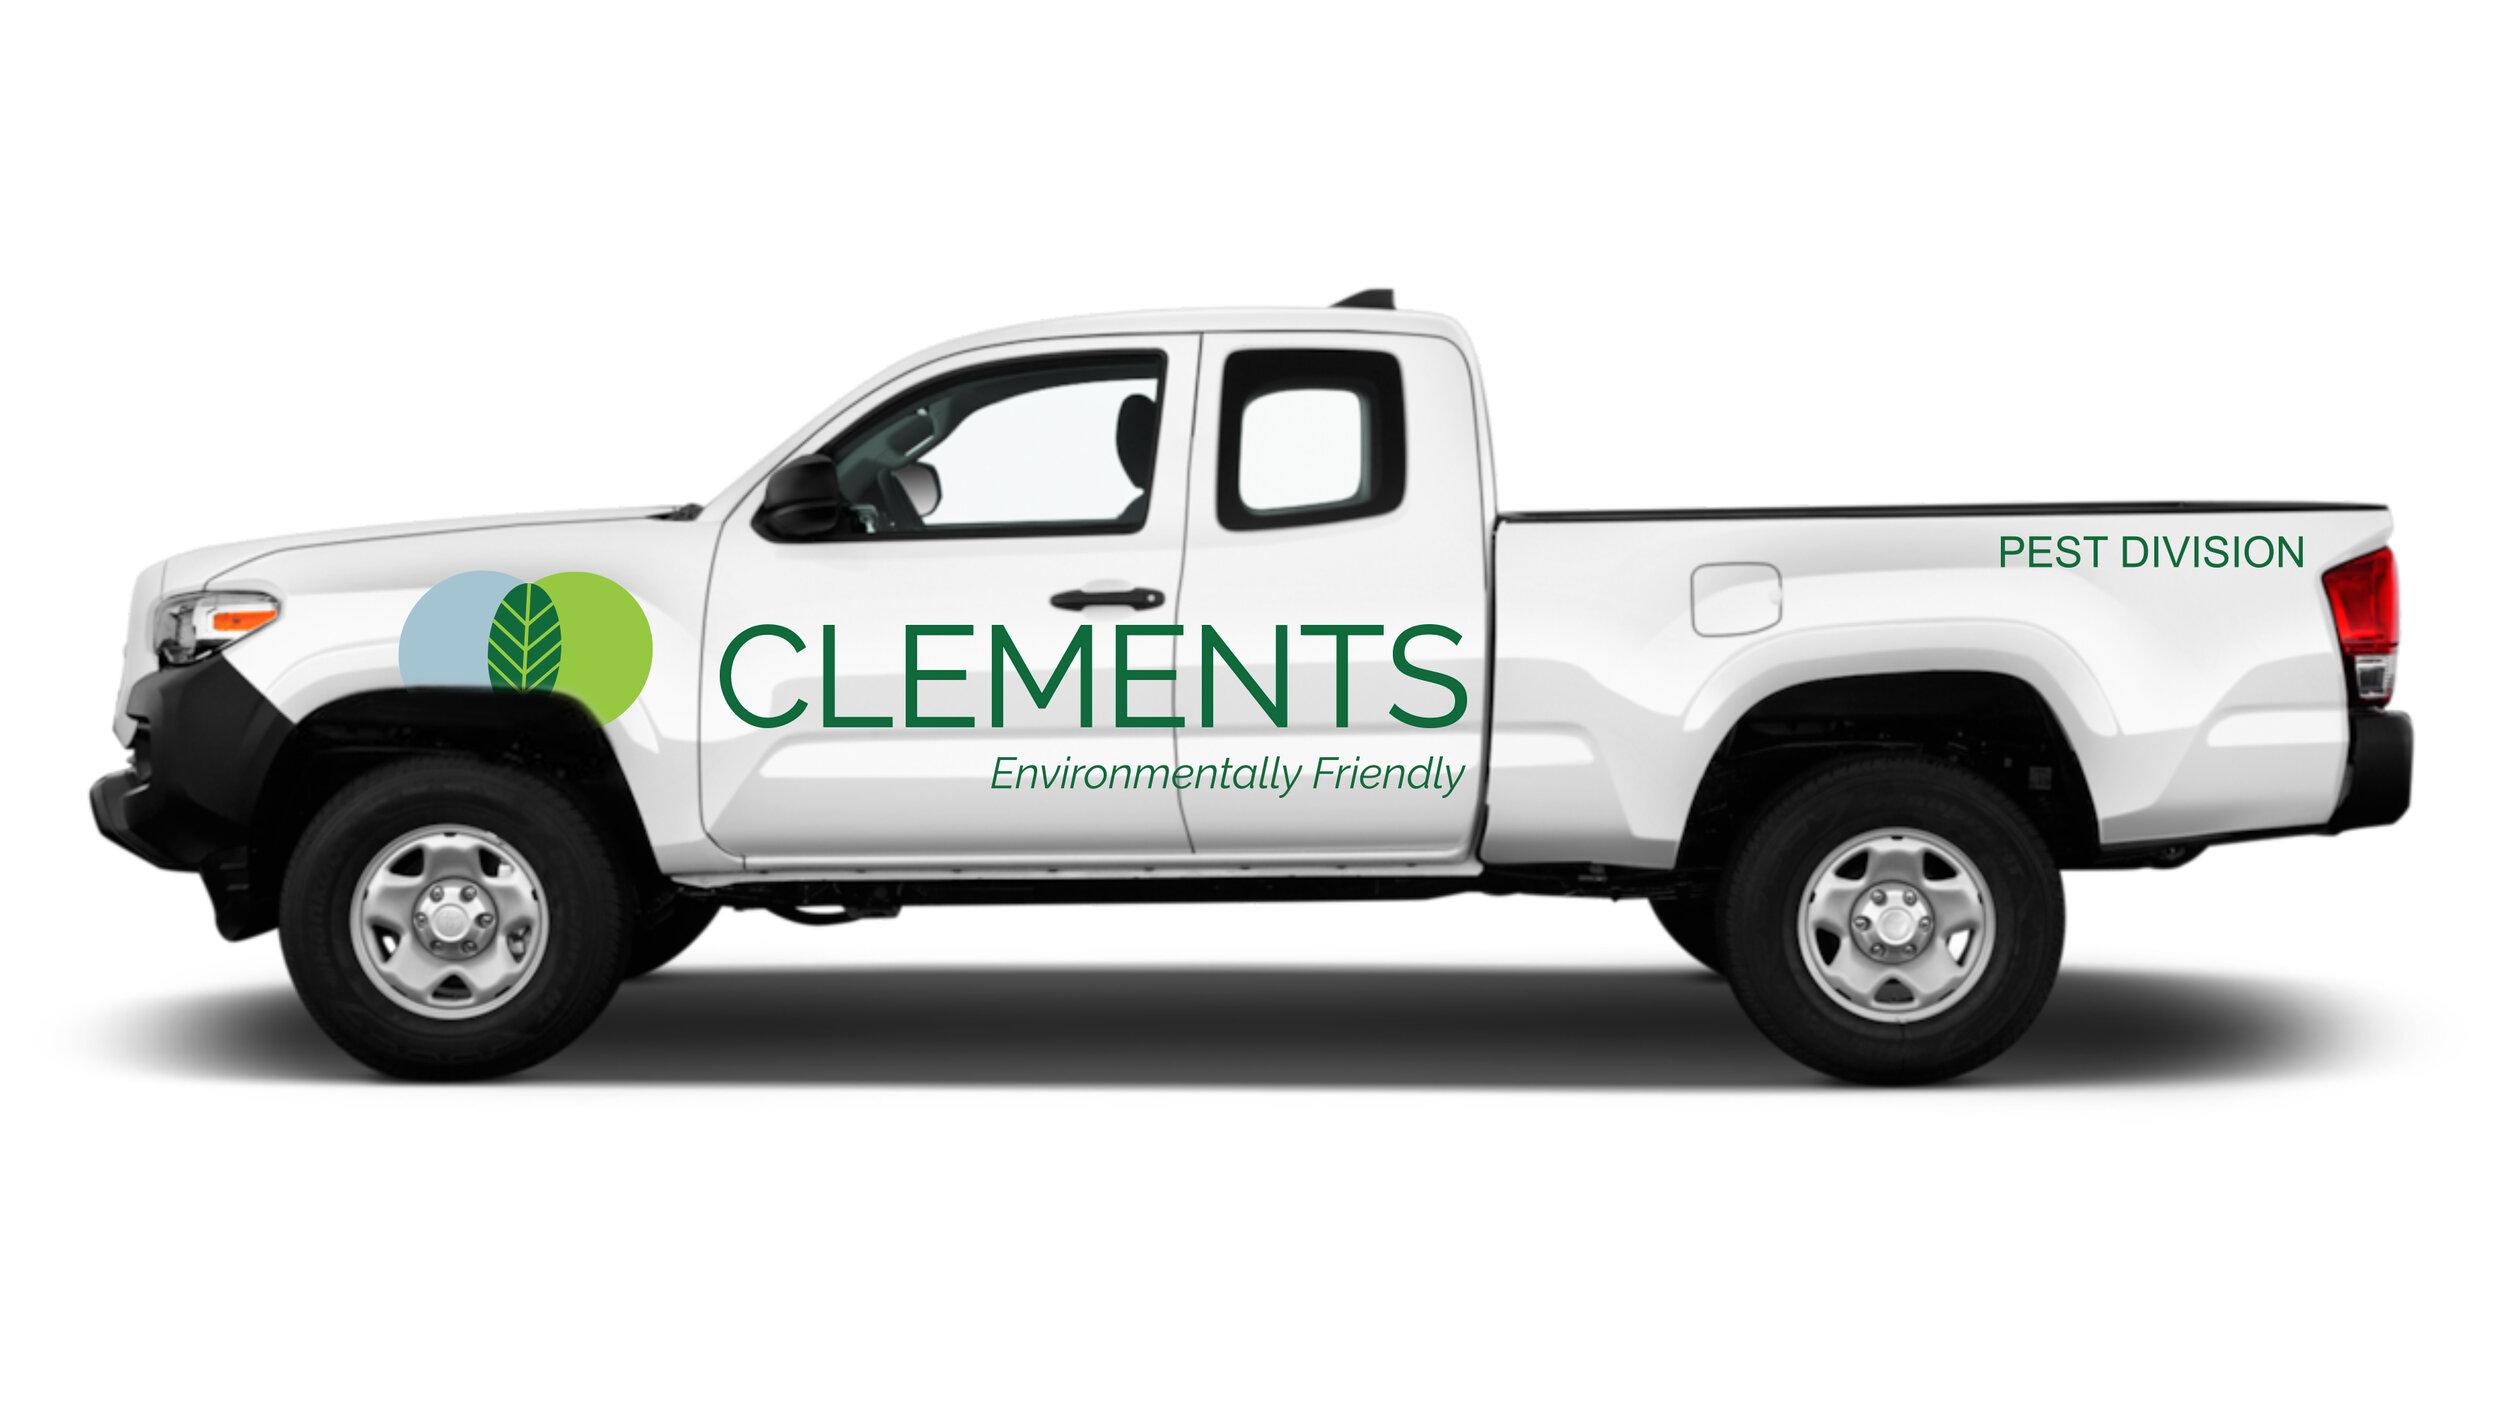 Clements truck for website image_2  (1).jpg